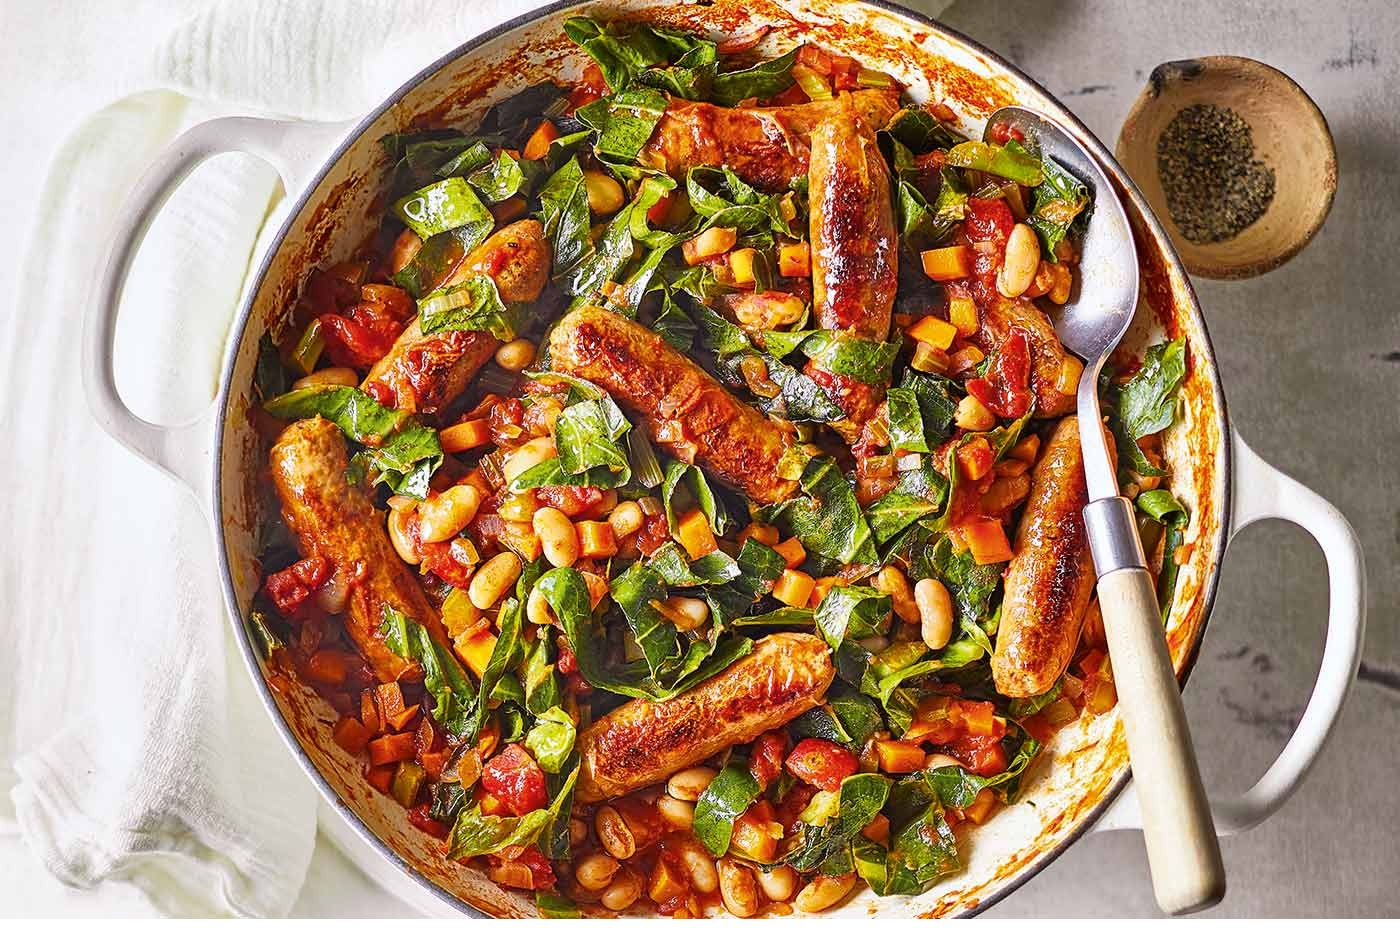 Sausage And Cannellini Bean Casserole